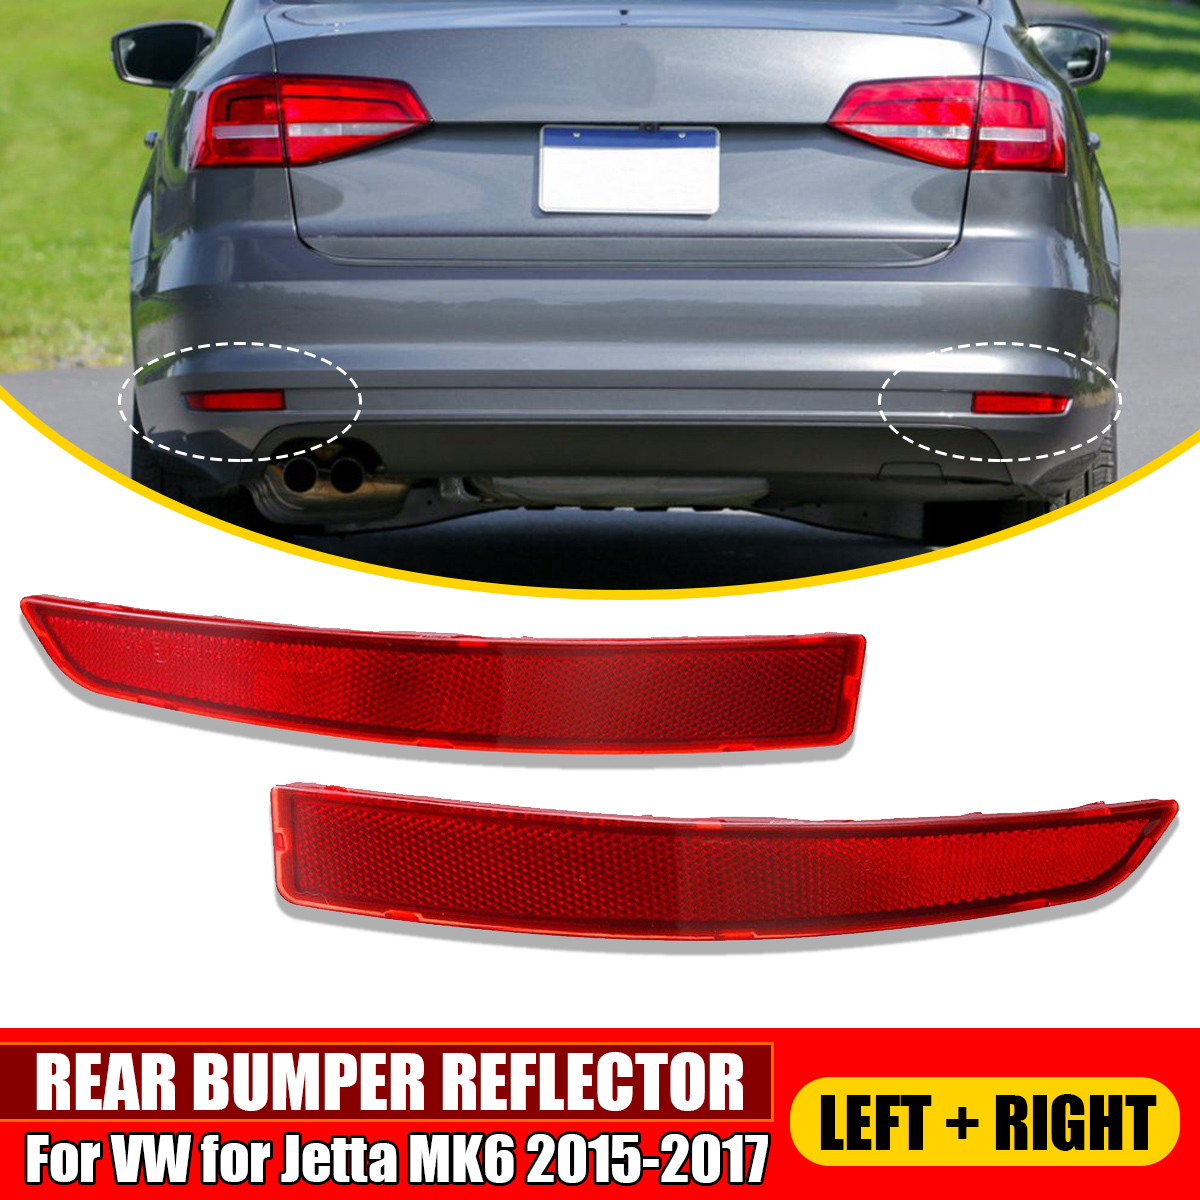 1 PCS Left Right Rear Bumper Refletor Serve Para VW Jetta para 2015 2016 2017 MK6 Passenger Side Marcador # 5C6945105B 5C6945106B Novo